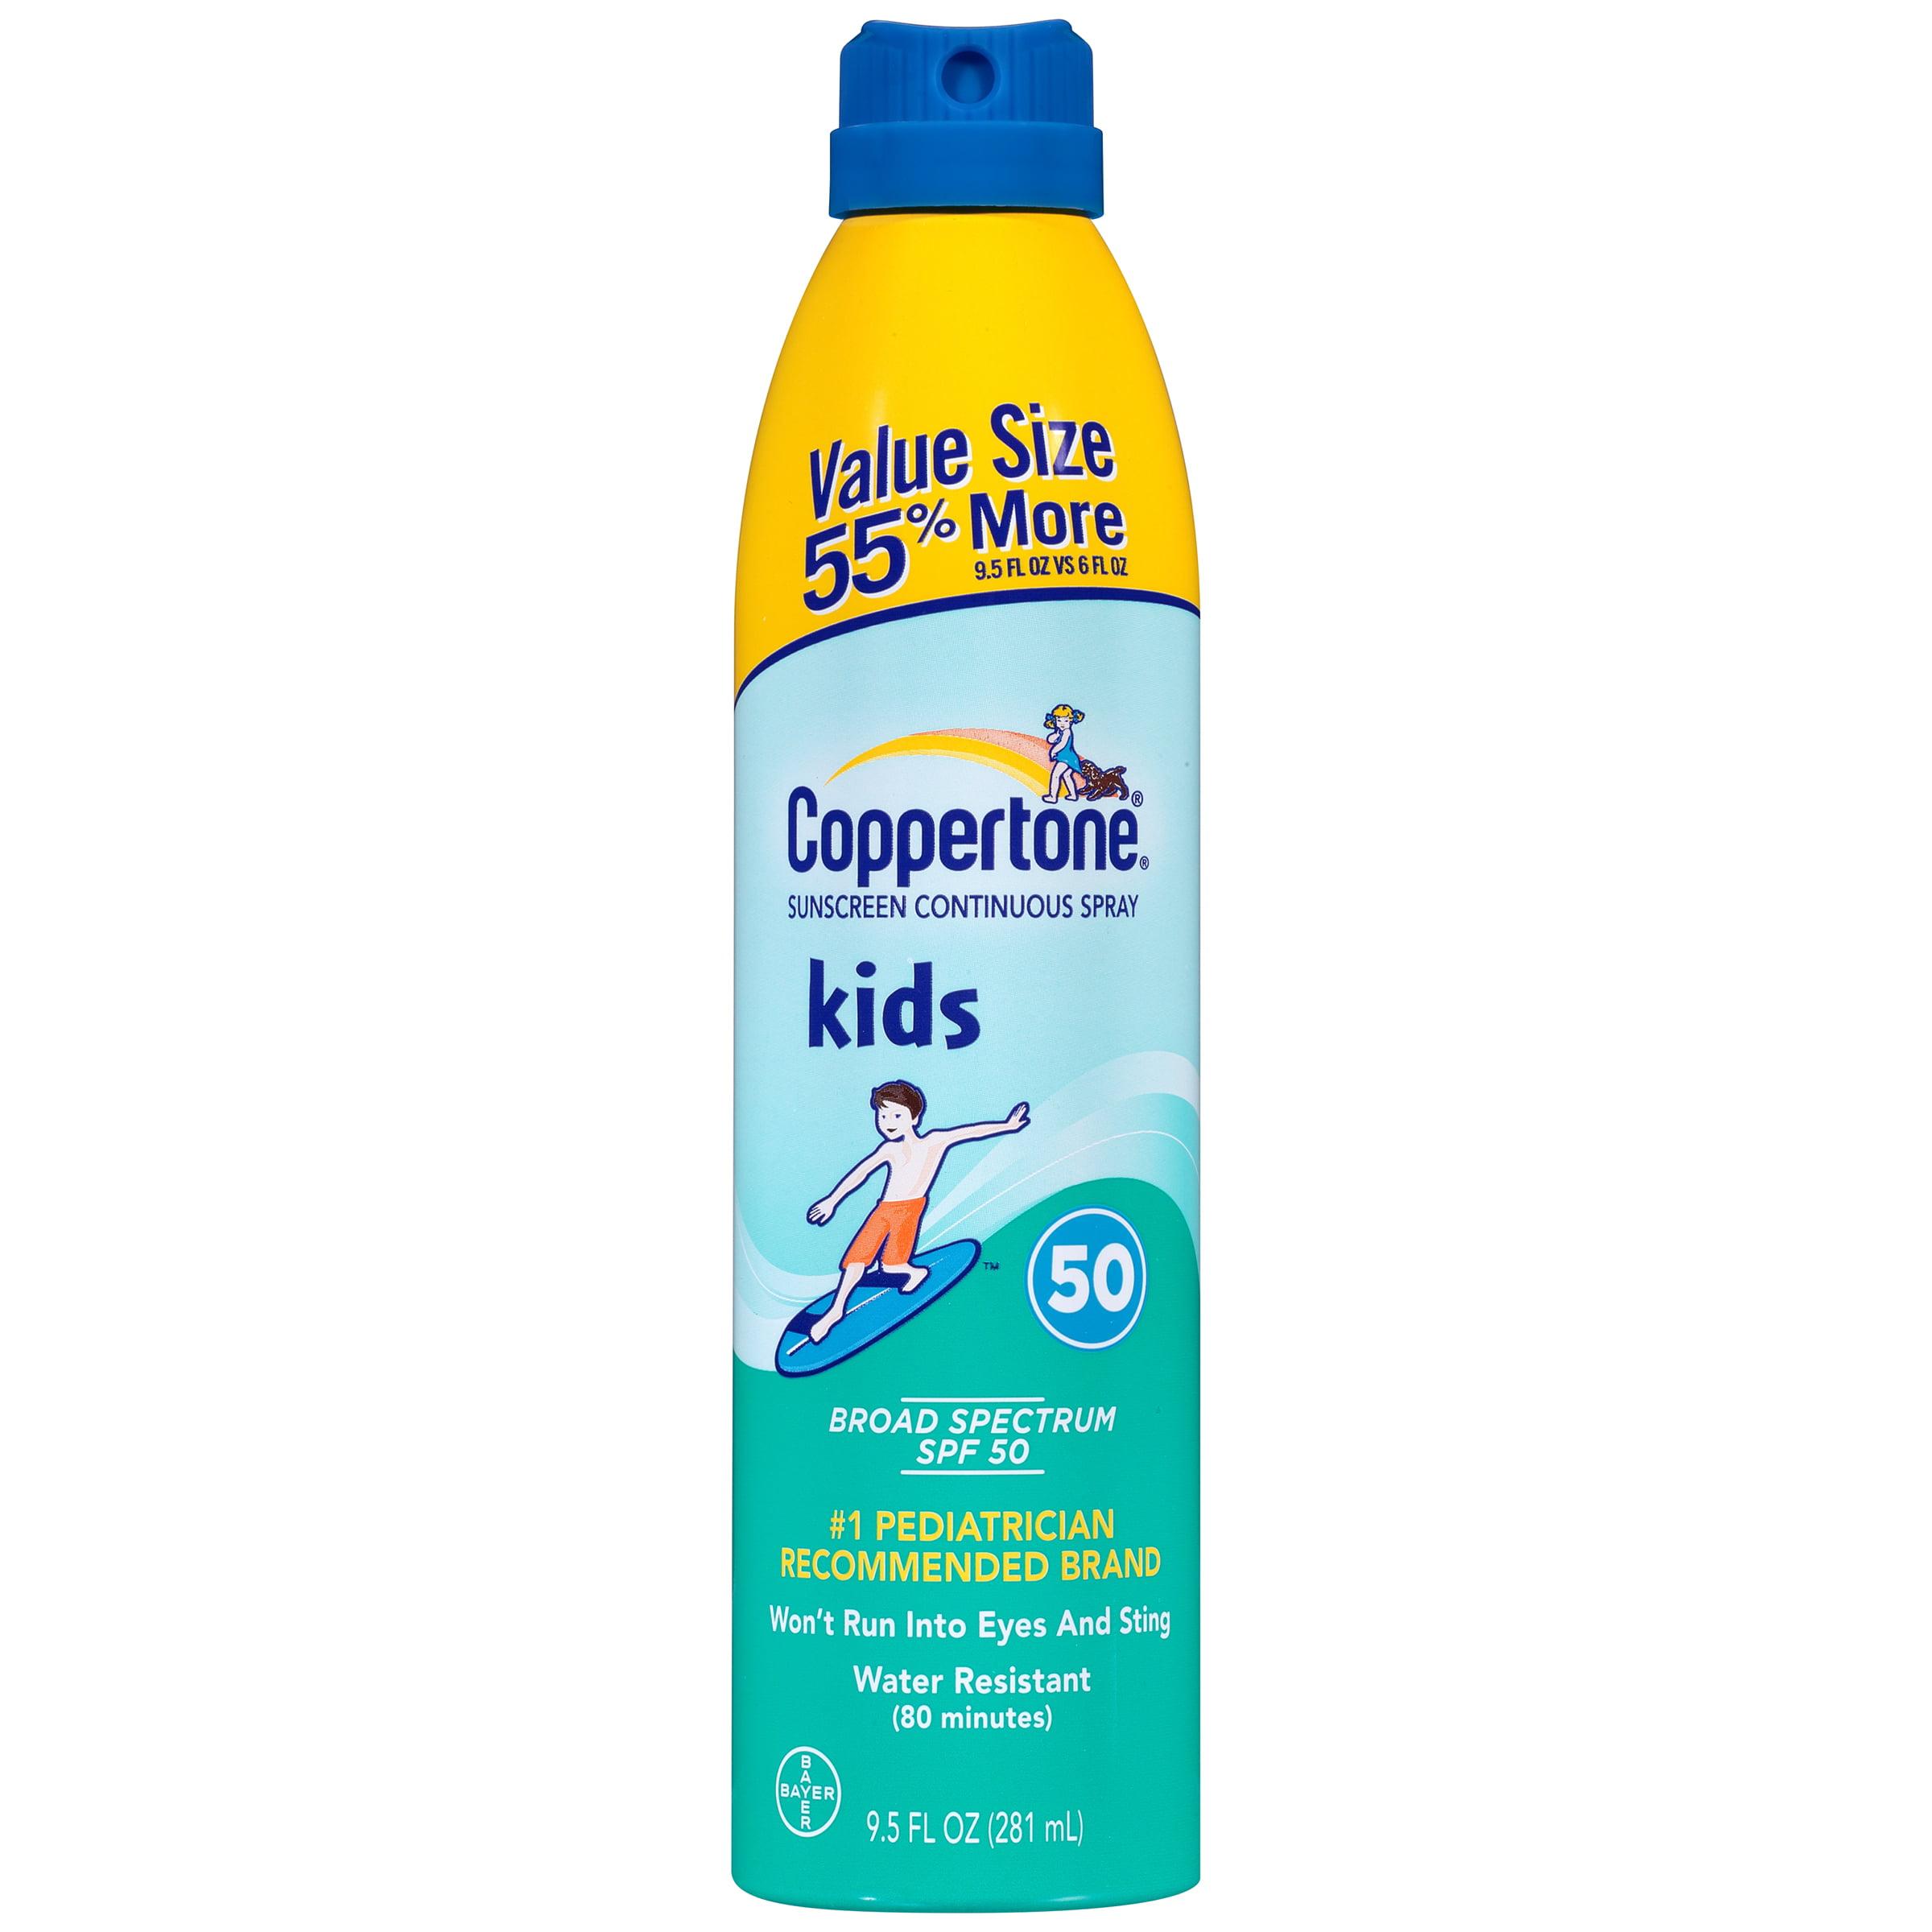 Coppertone Kids Continuous Spray Sunscreen, SPF 50, 9.5 oz